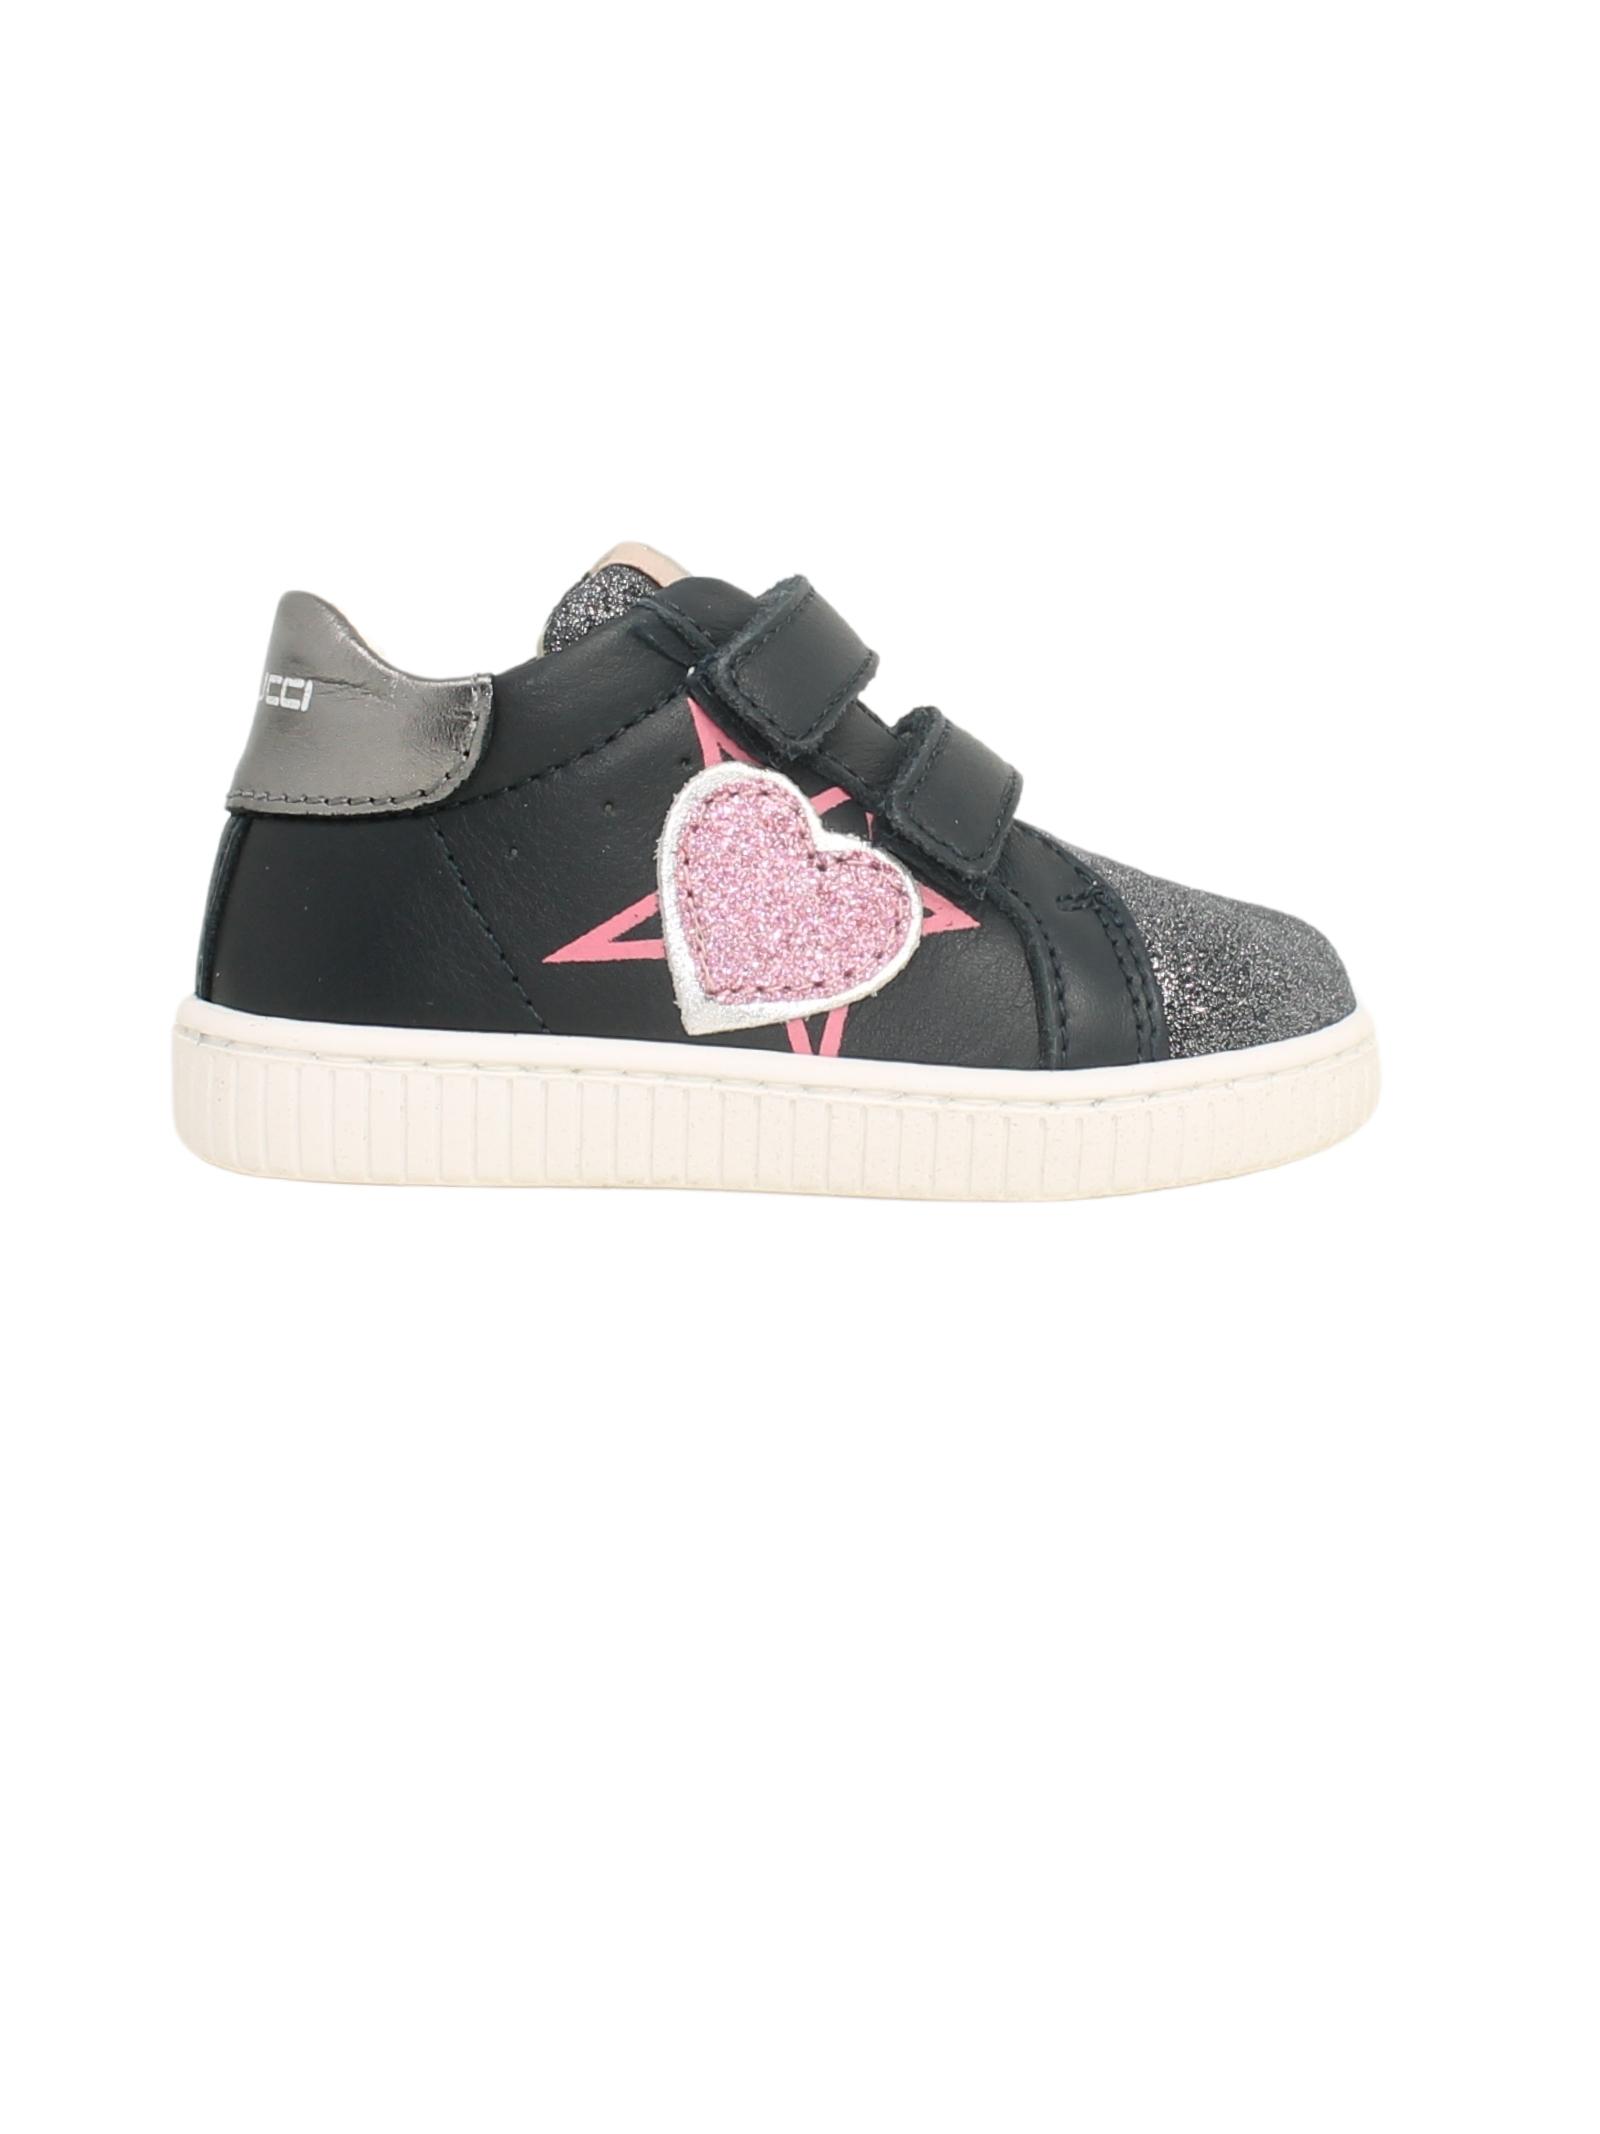 Lurex sneakers for girls BALDUCCI | Sneakers | MSPO3817BLU